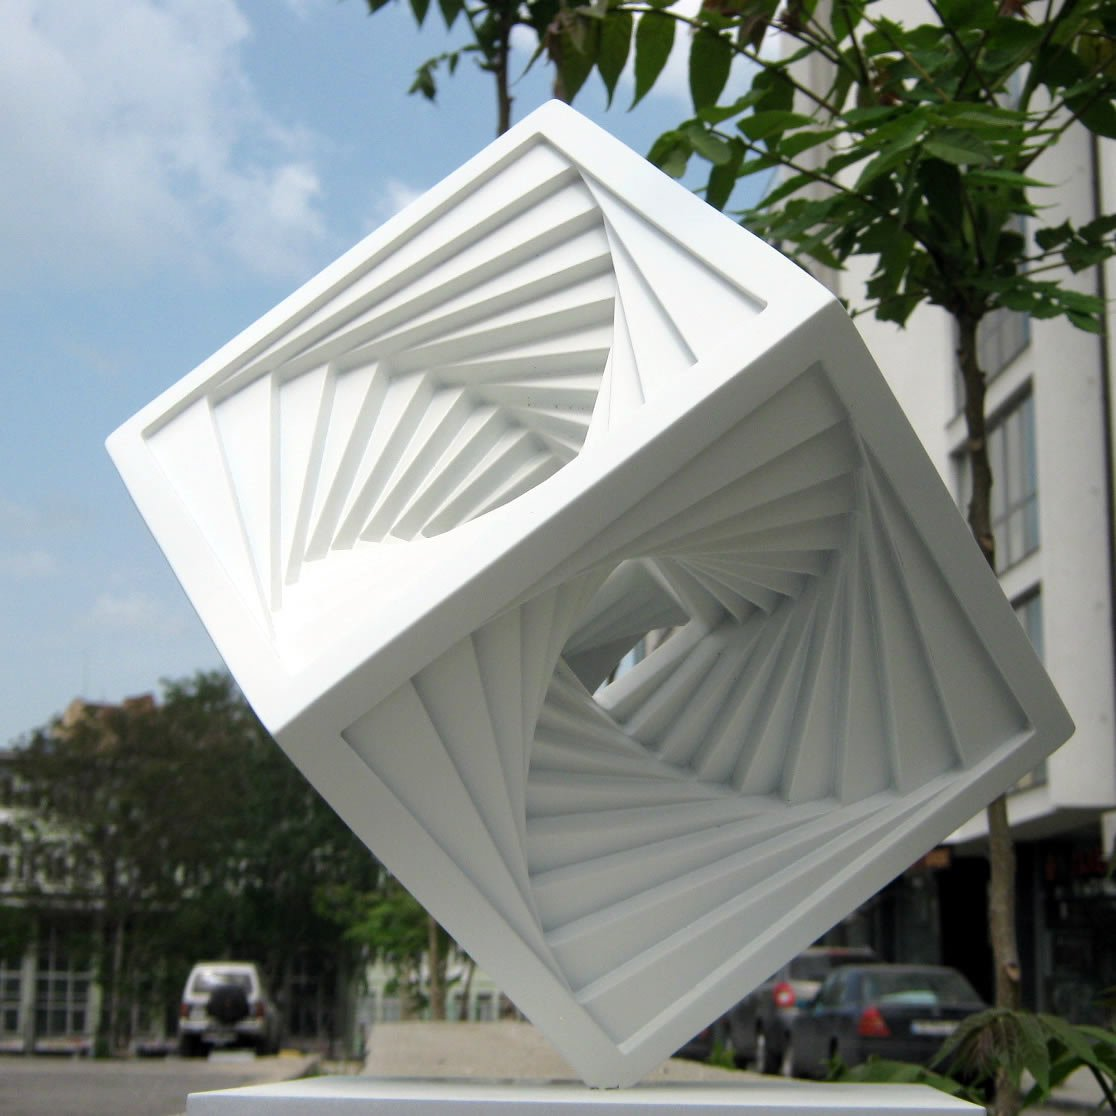 Spiralcube by Radoslav Sultov